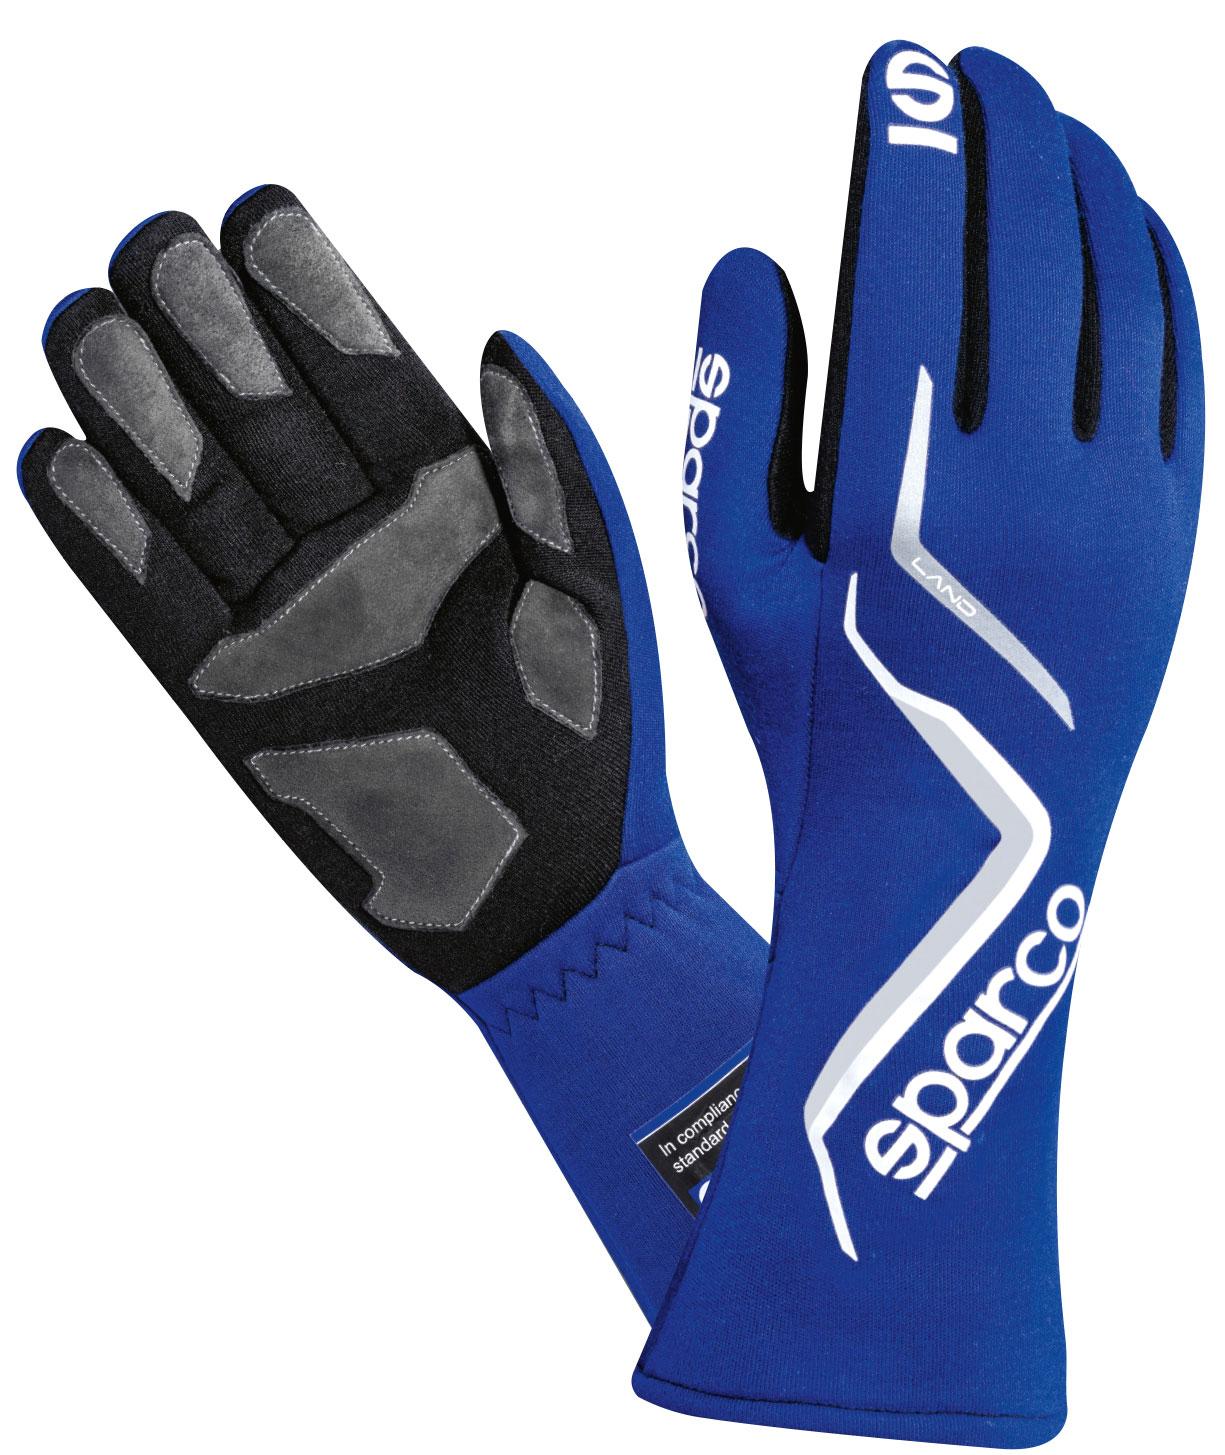 Sparco Handschuh Land, blau